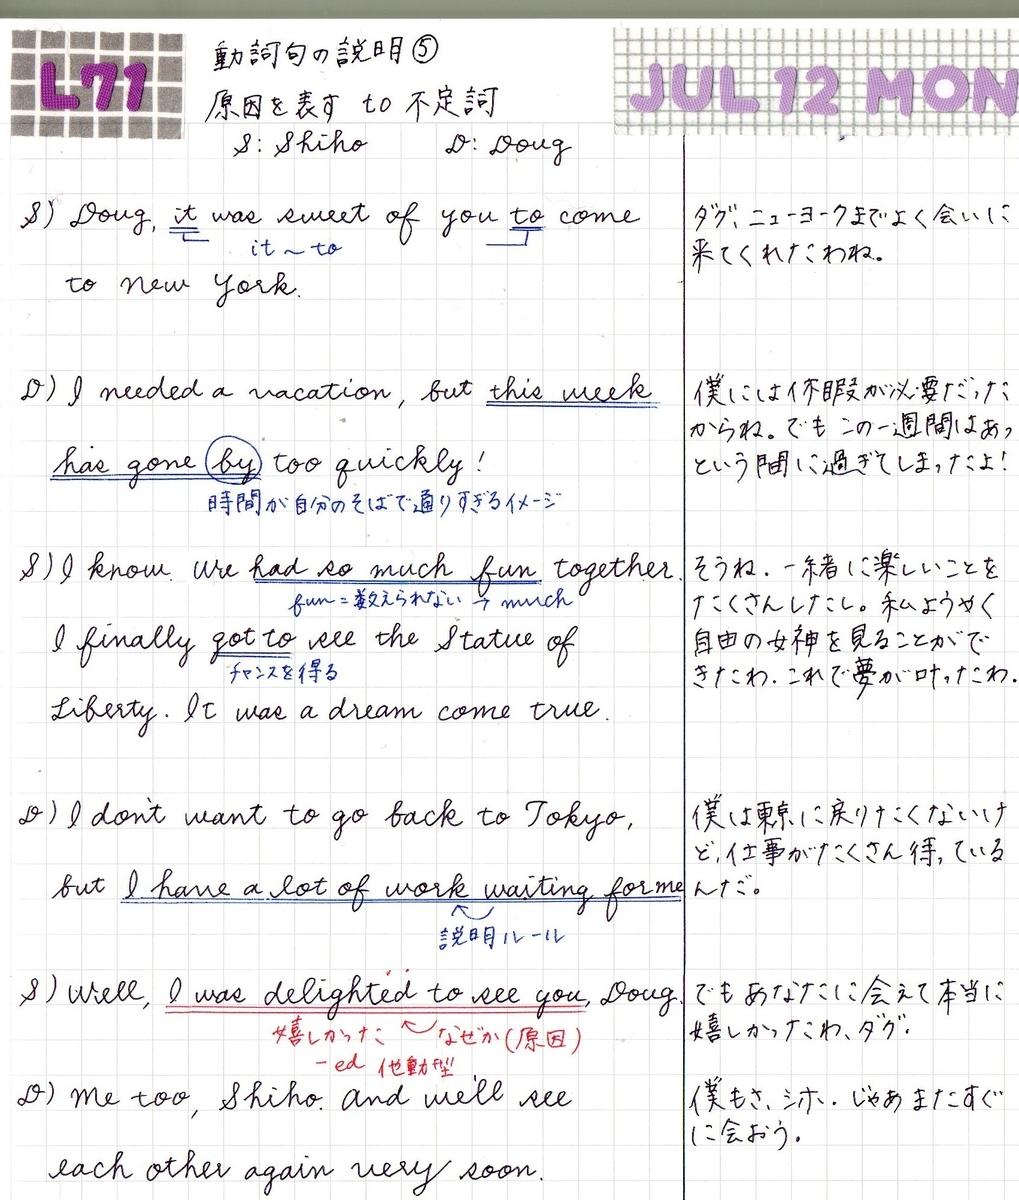 f:id:yuki-freestyle-sk8:20210722052926j:plain